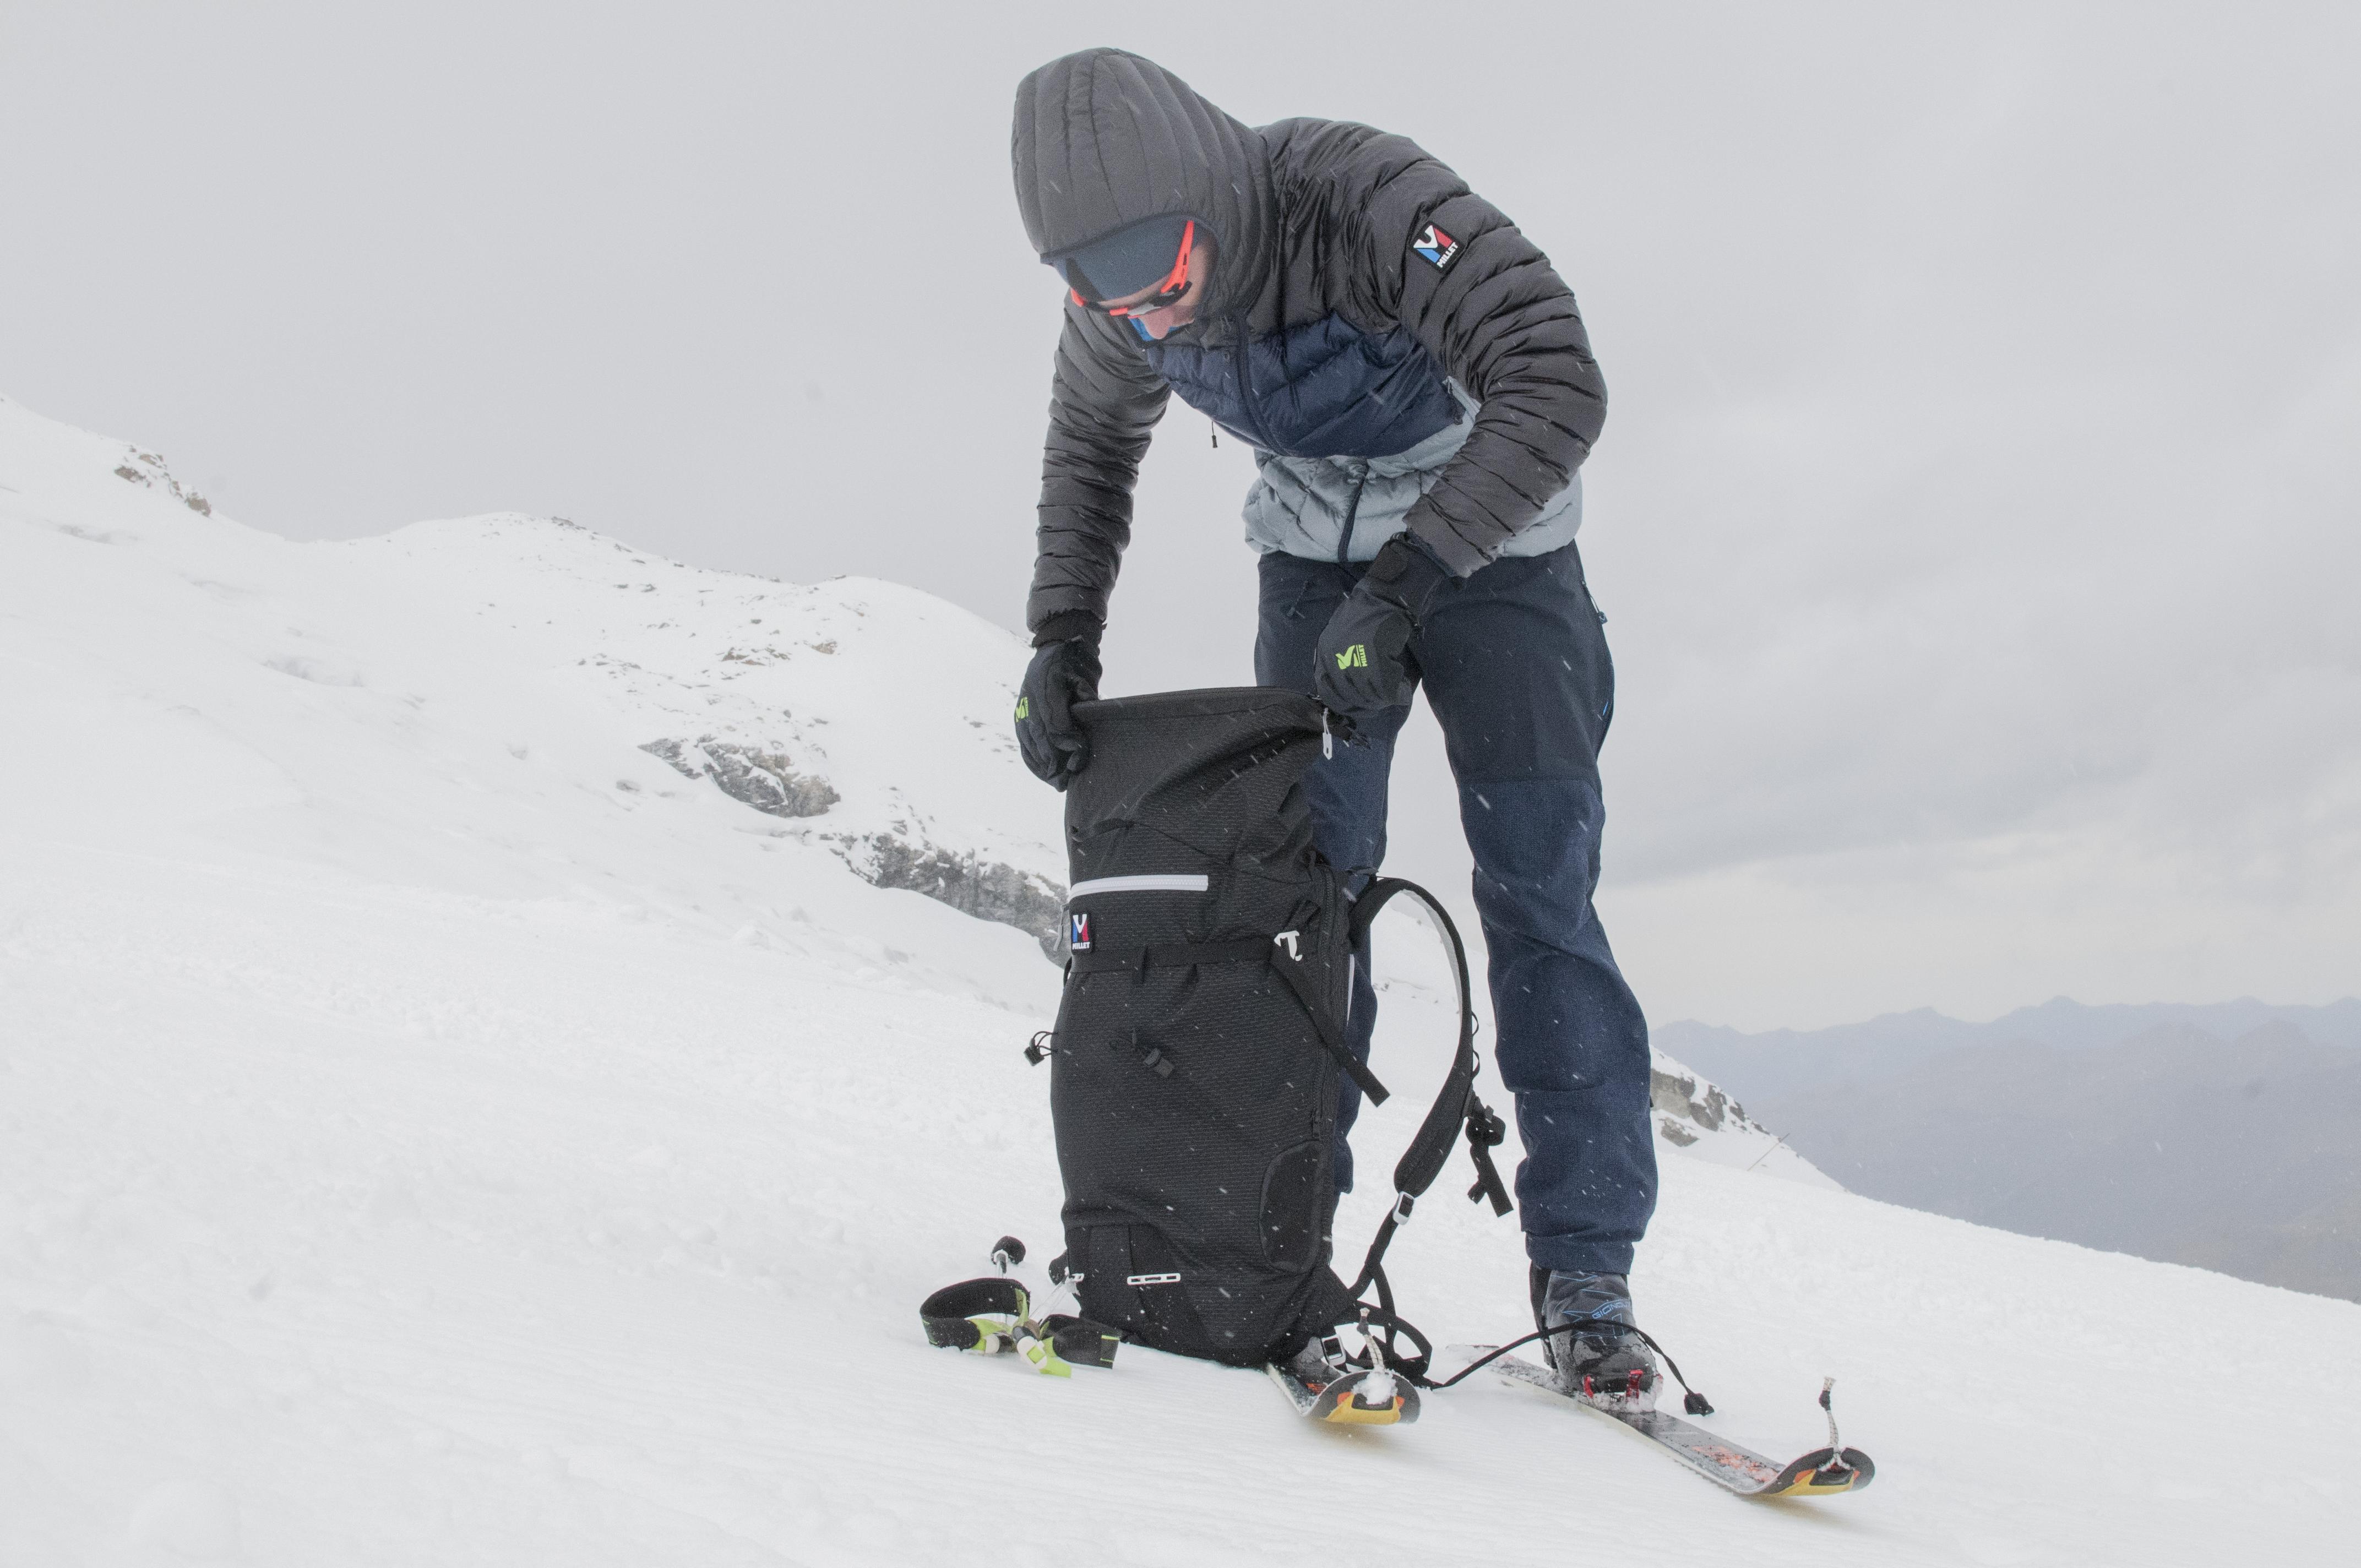 Plecak skitourowy (fot. millet.fr)